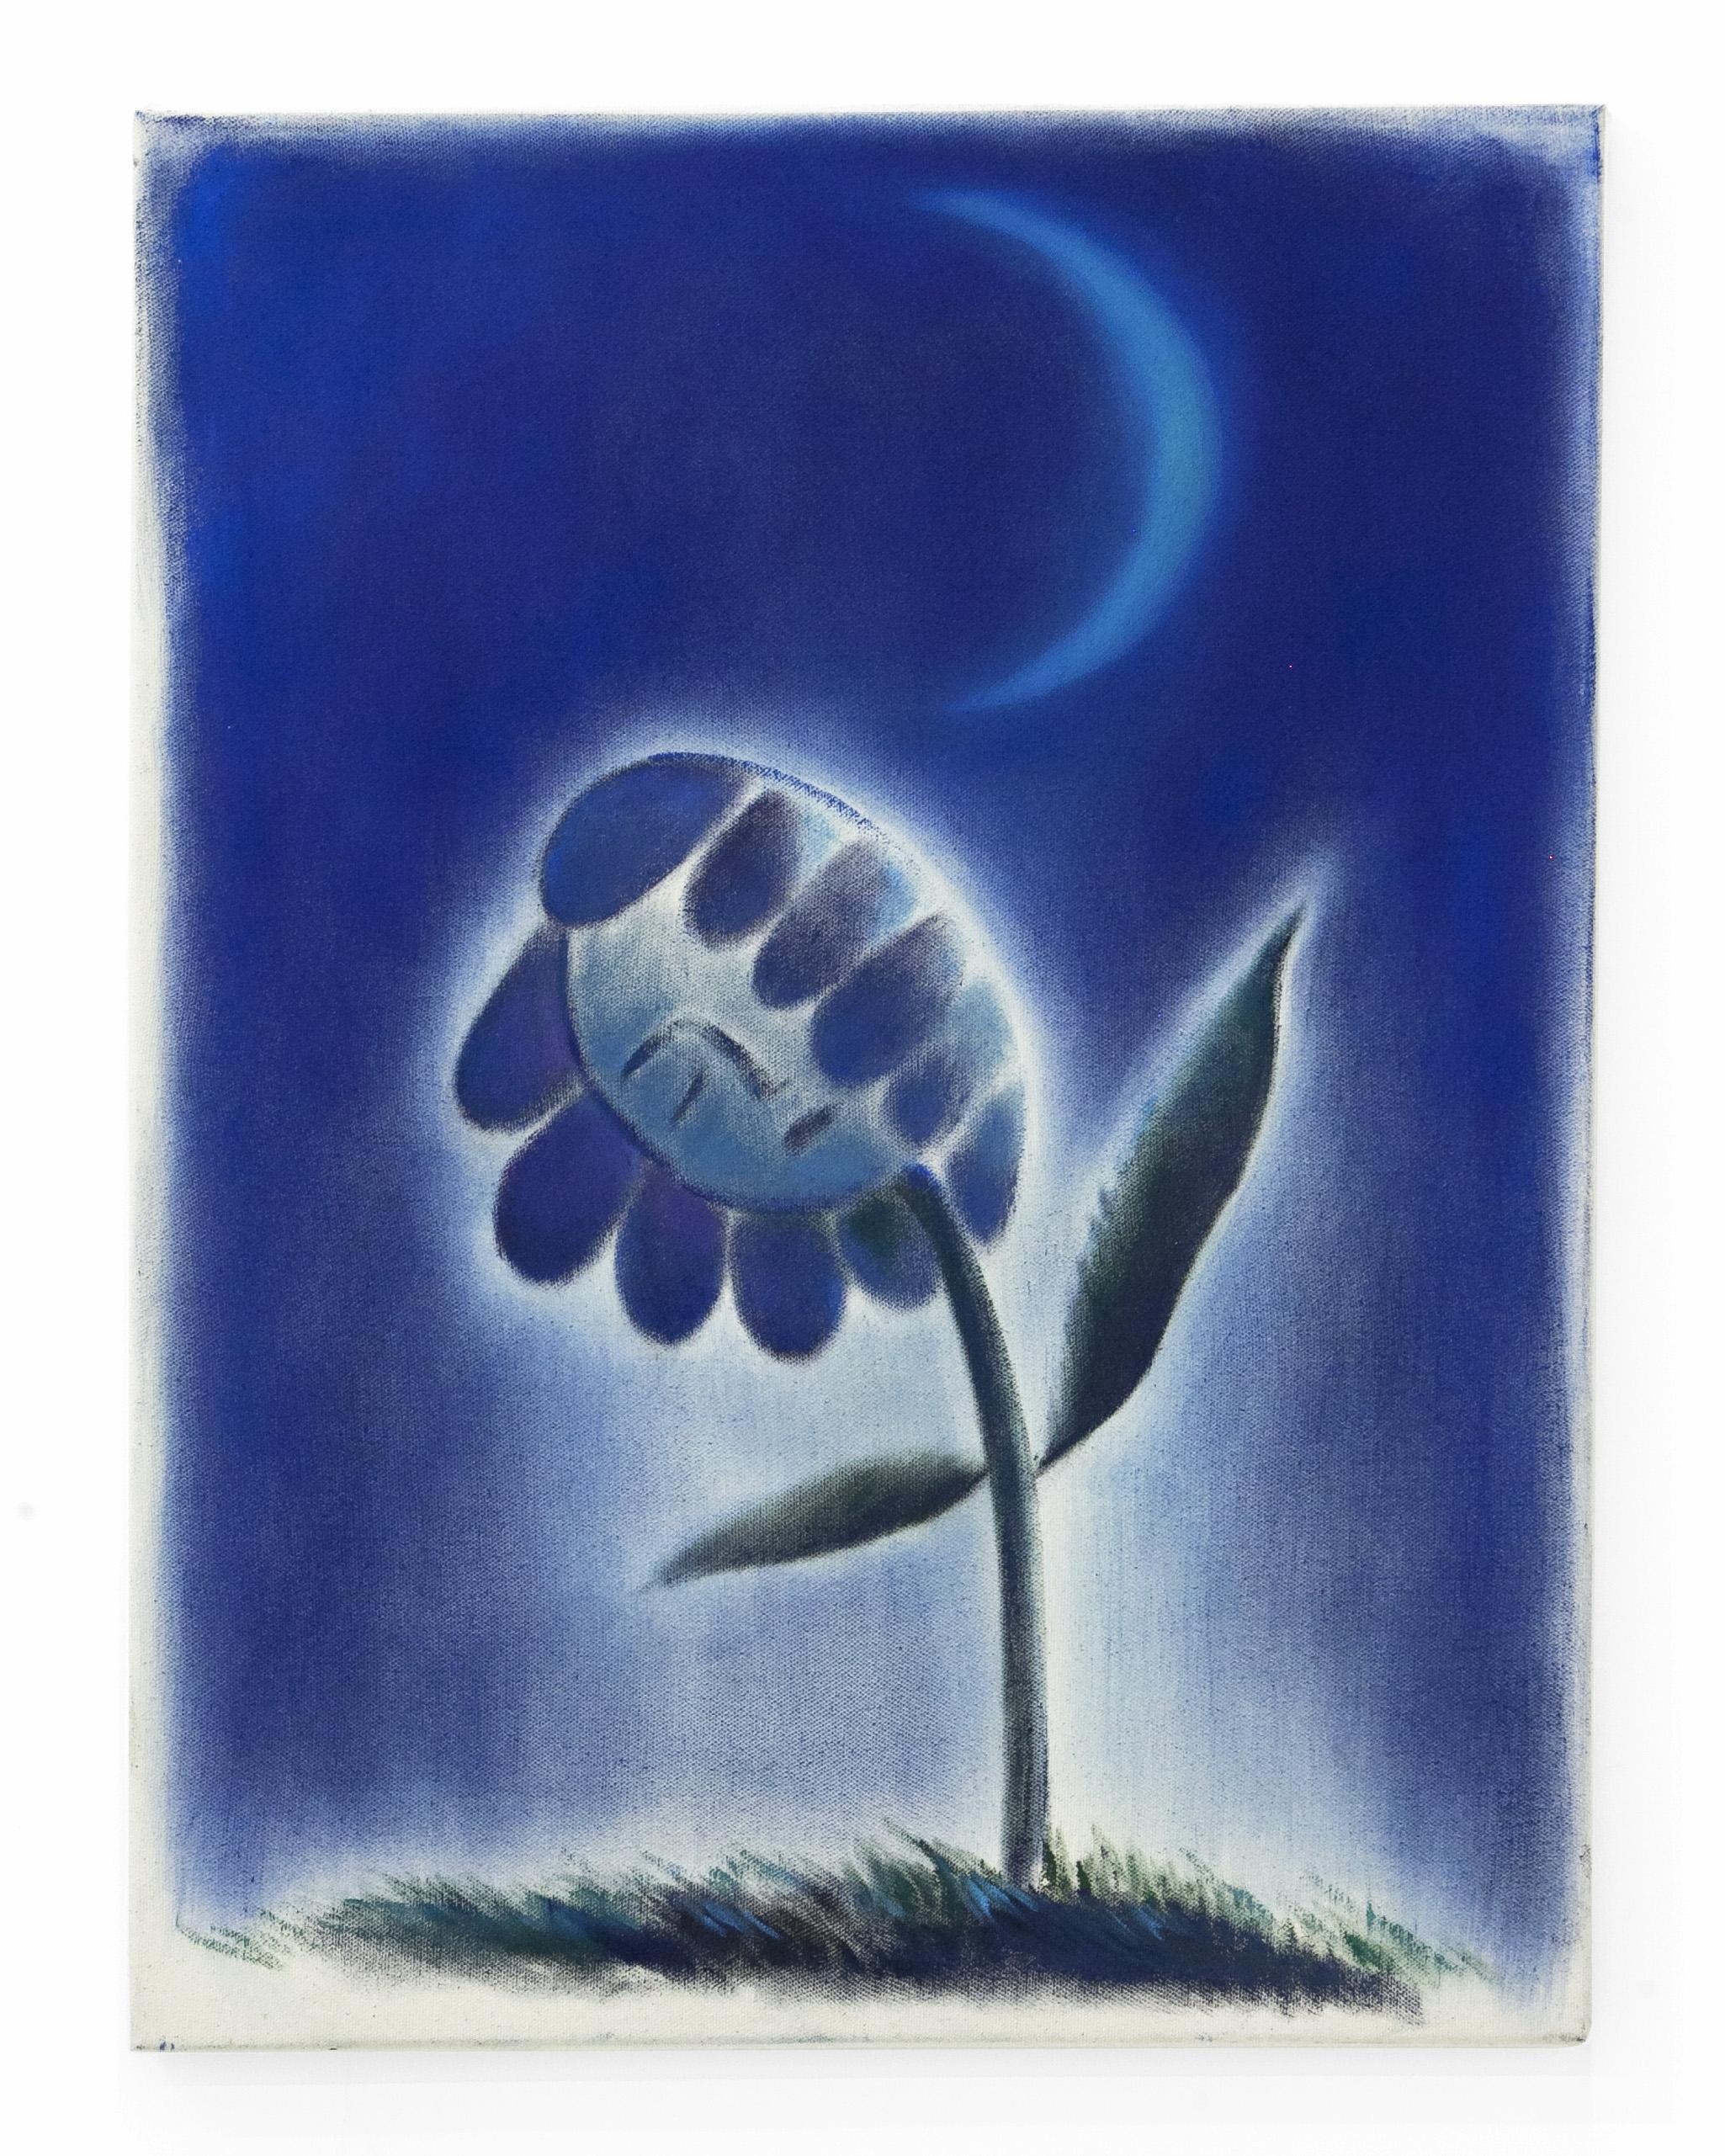 "Sarah Thibault -"" Sleeping (Under Moon) "". Oil on Canvas.24 x 18. 2018.info@part2gallery.com"